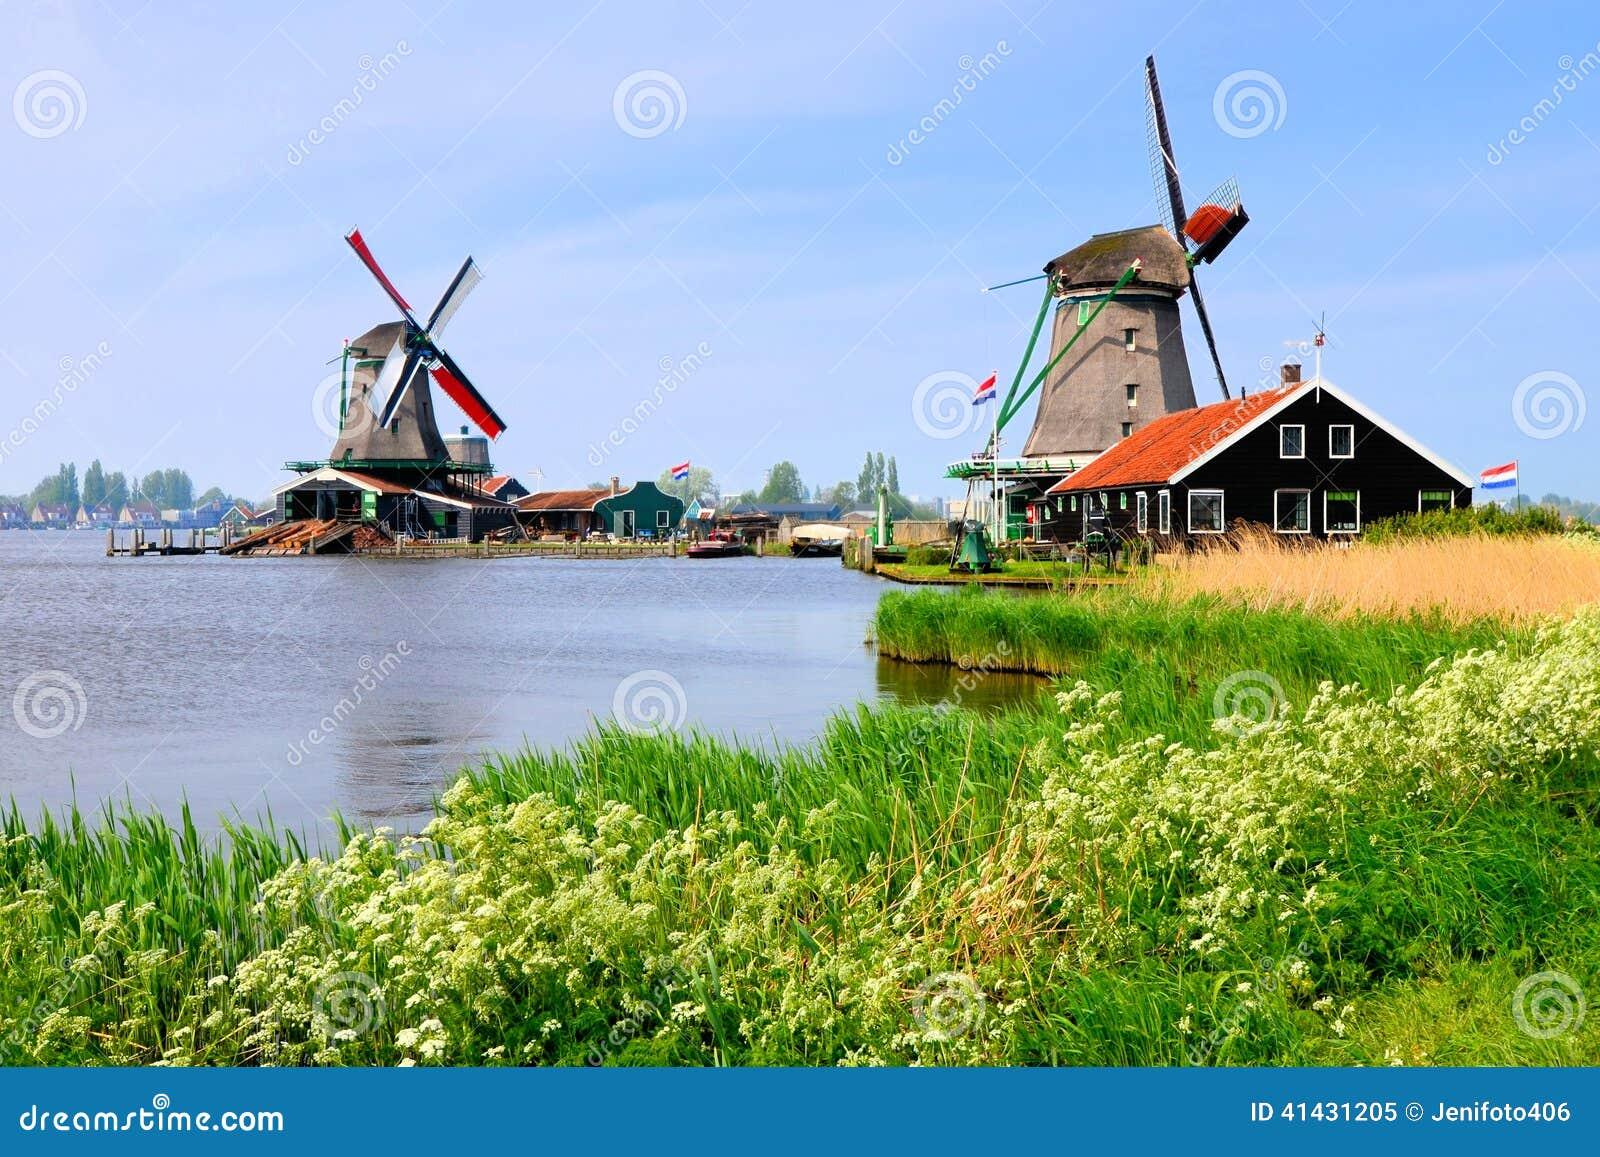 Dutch windmills of Zaanse Schans